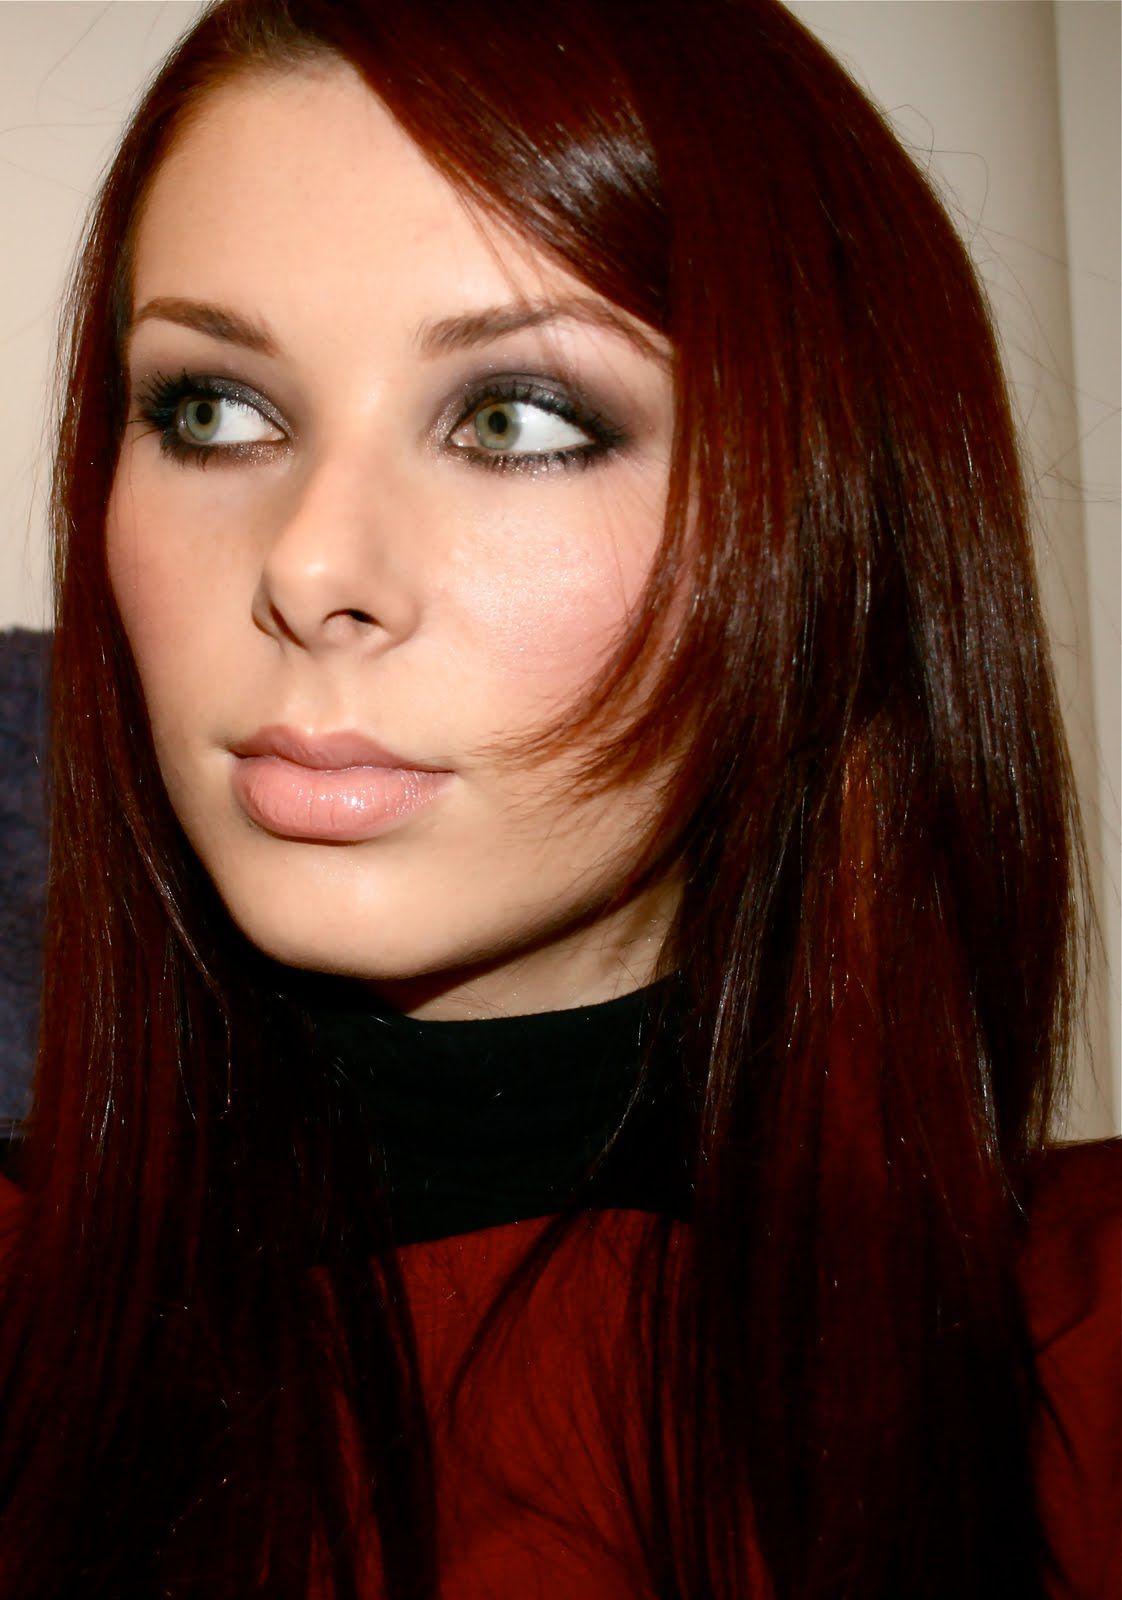 Shadow look for green eyes Green eyes, Hair, Makeup